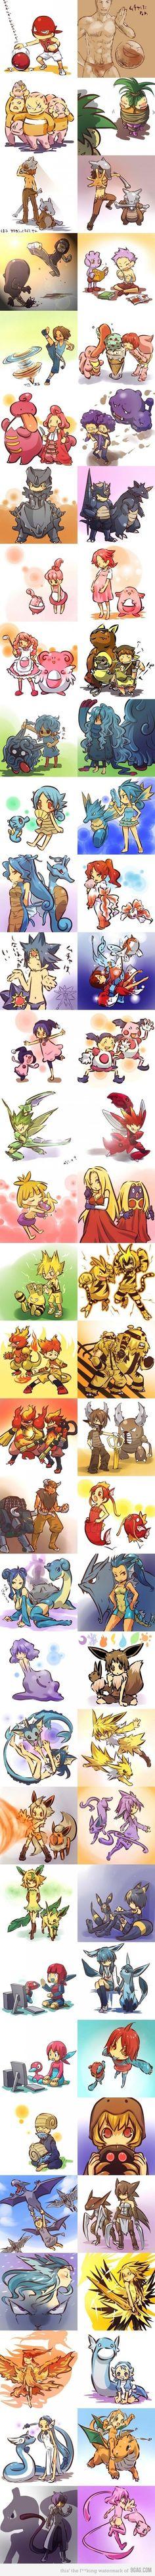 so nice.......seeing pokemons turn into humans